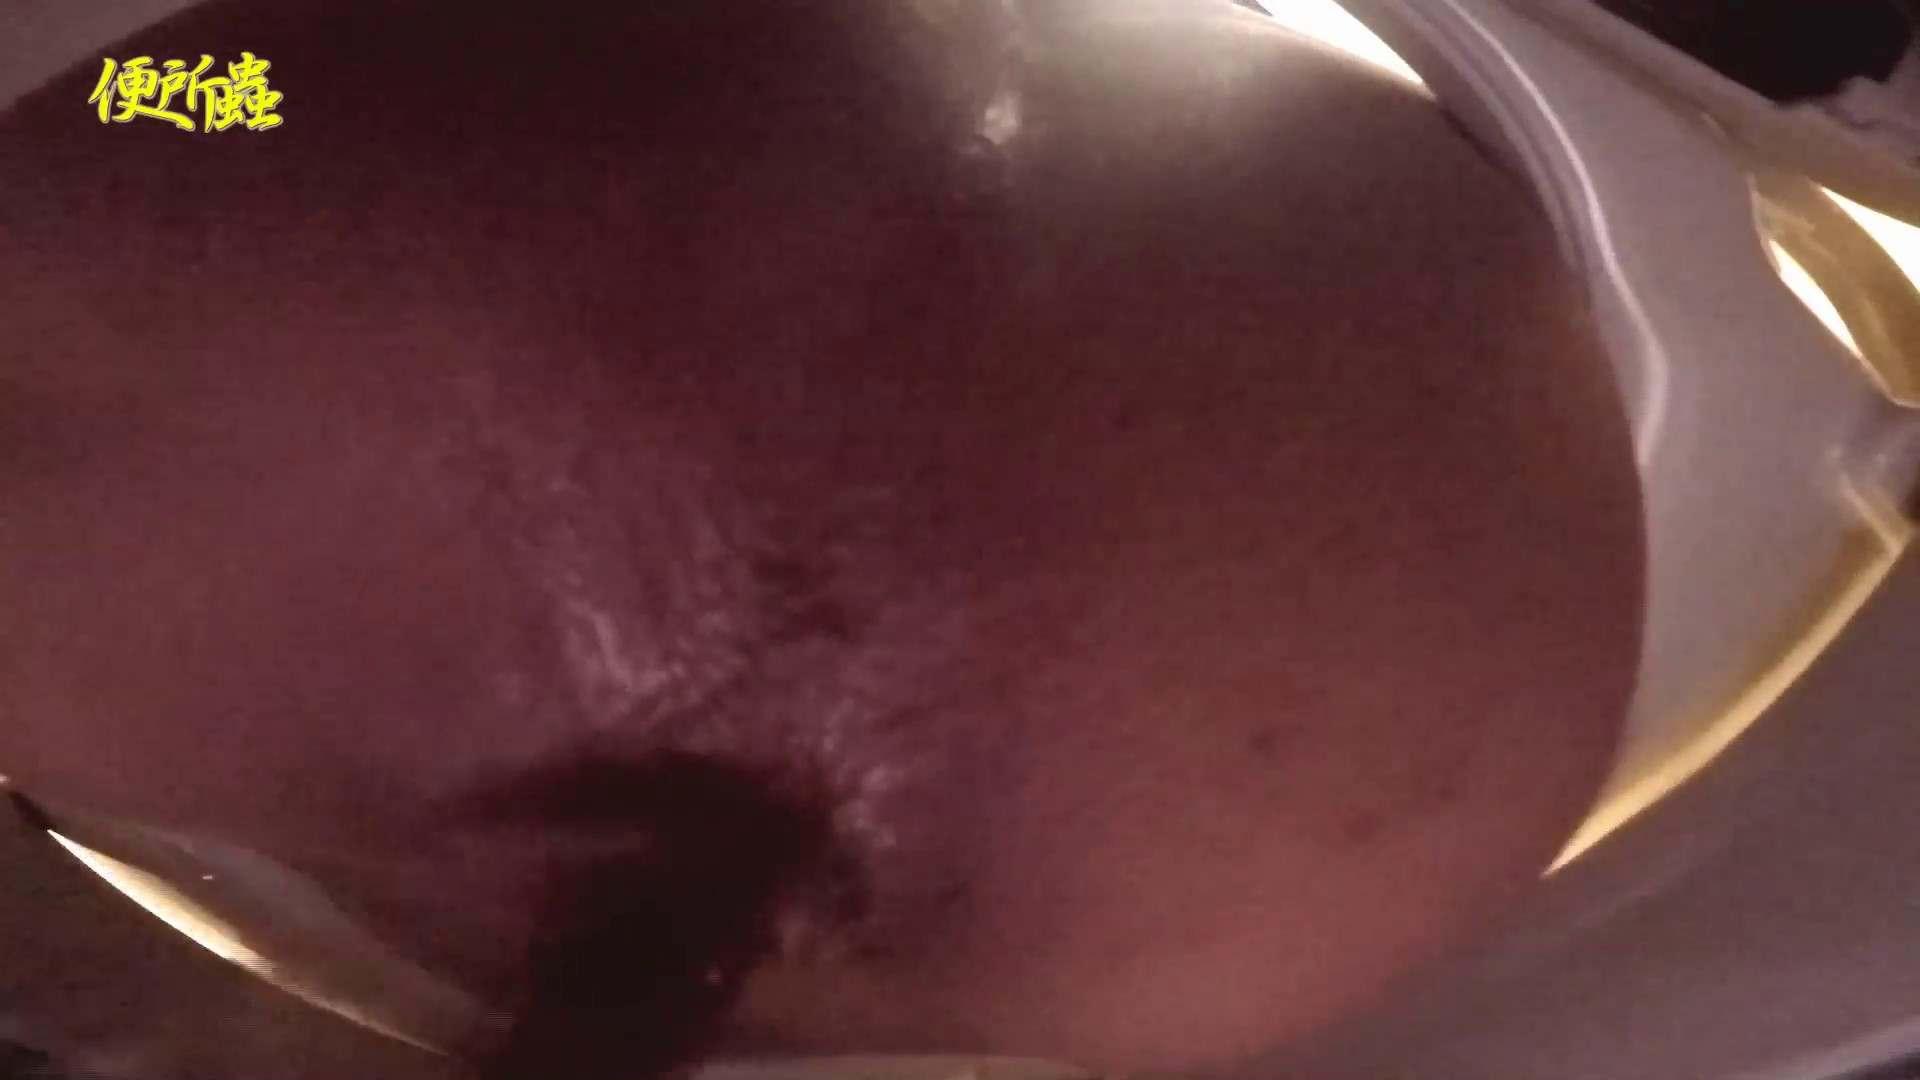 vol.11 便所蟲さんのリターン~寺子屋洗面所盗撮~脱〇三名 盗撮・必見 オマンコ動画キャプチャ 89画像 15